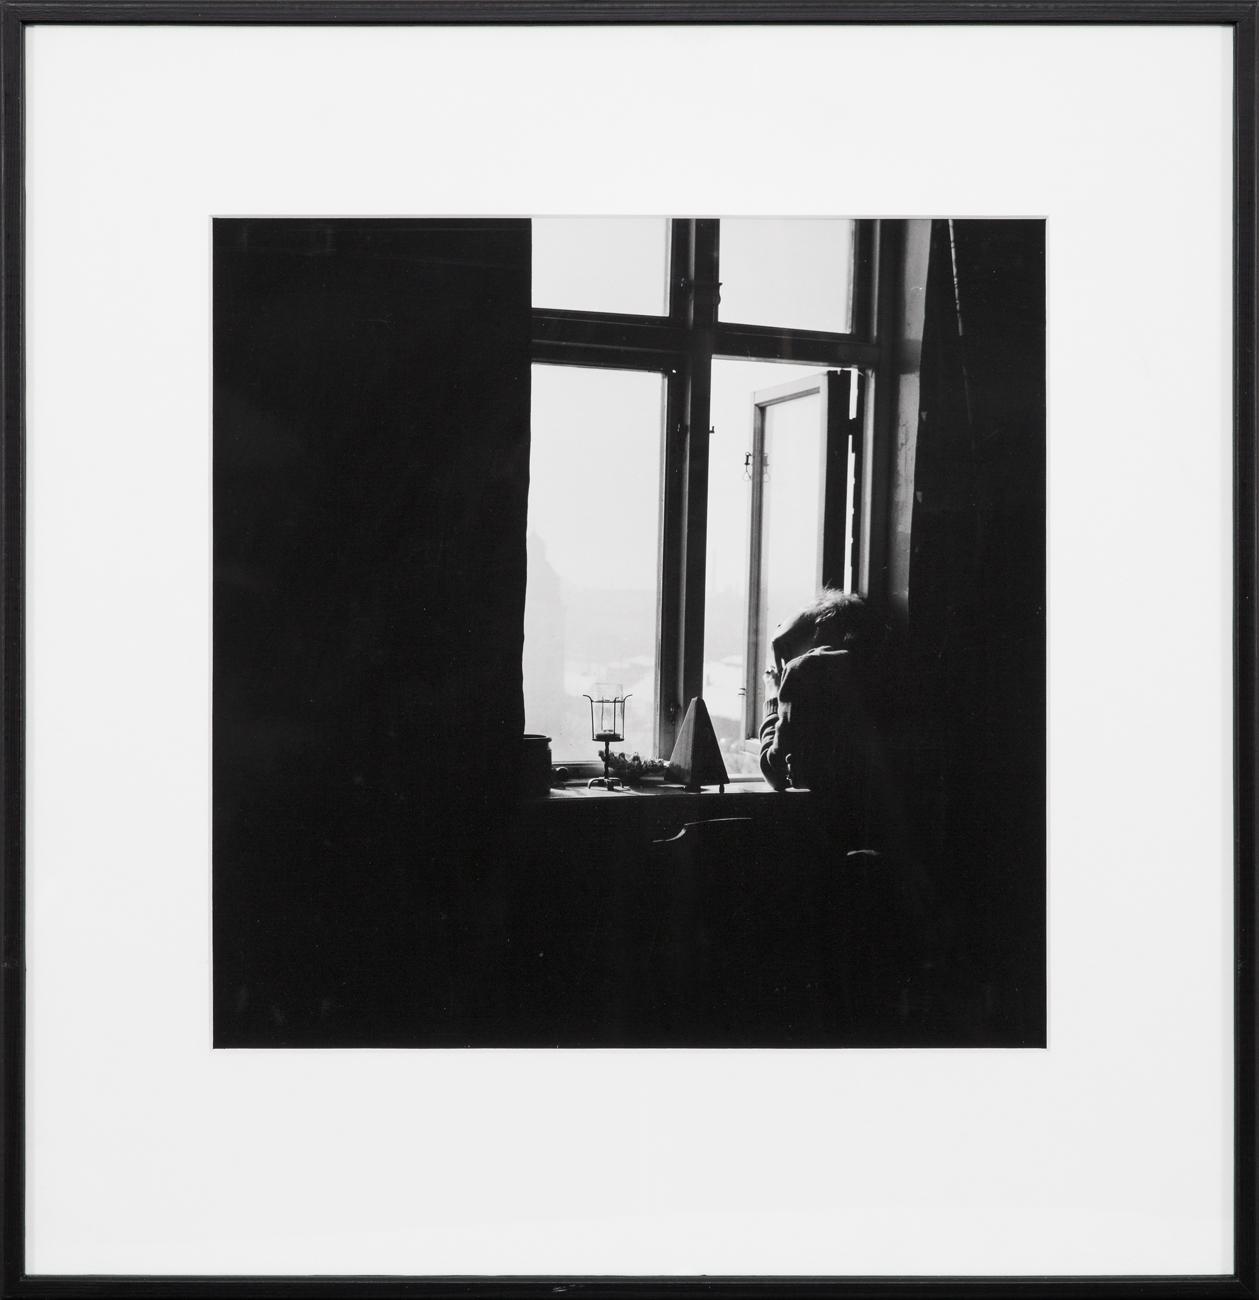 Ola Billgren  Vid fönstret  1962 Bromoil silver gelatin photograph Image sheet 33 x 33 cm